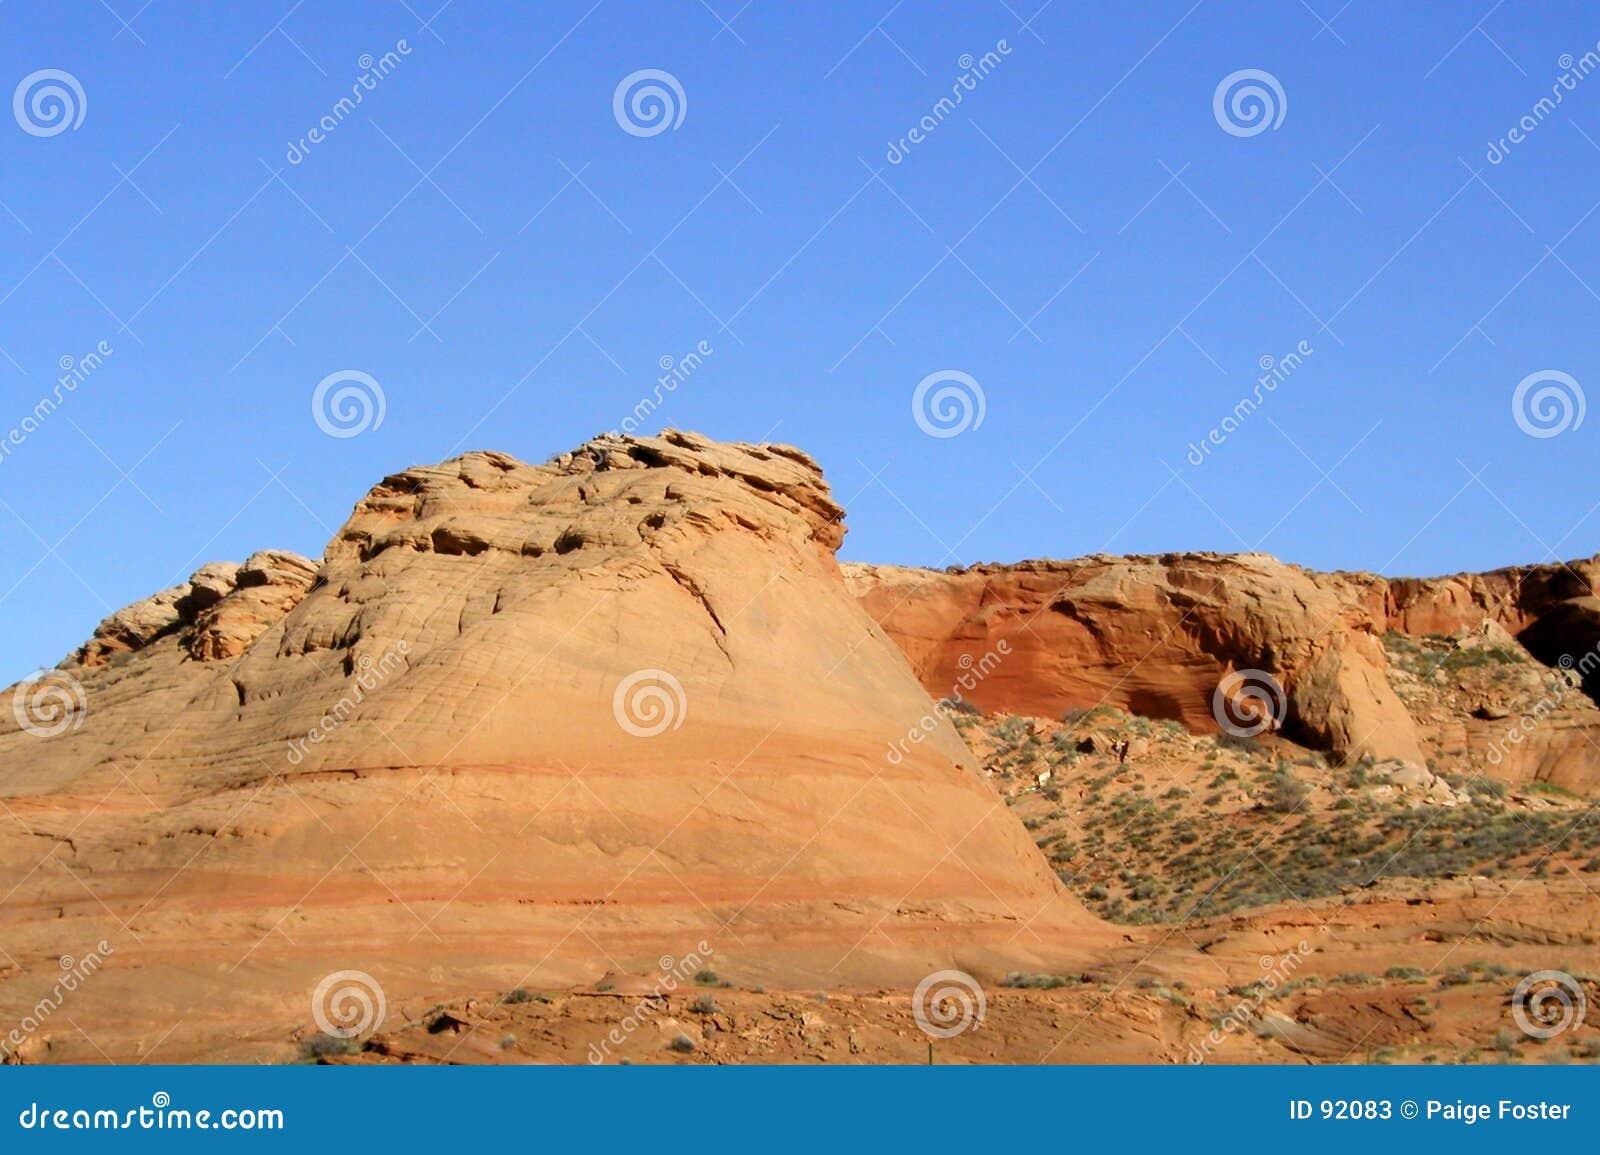 Formations de roche 1